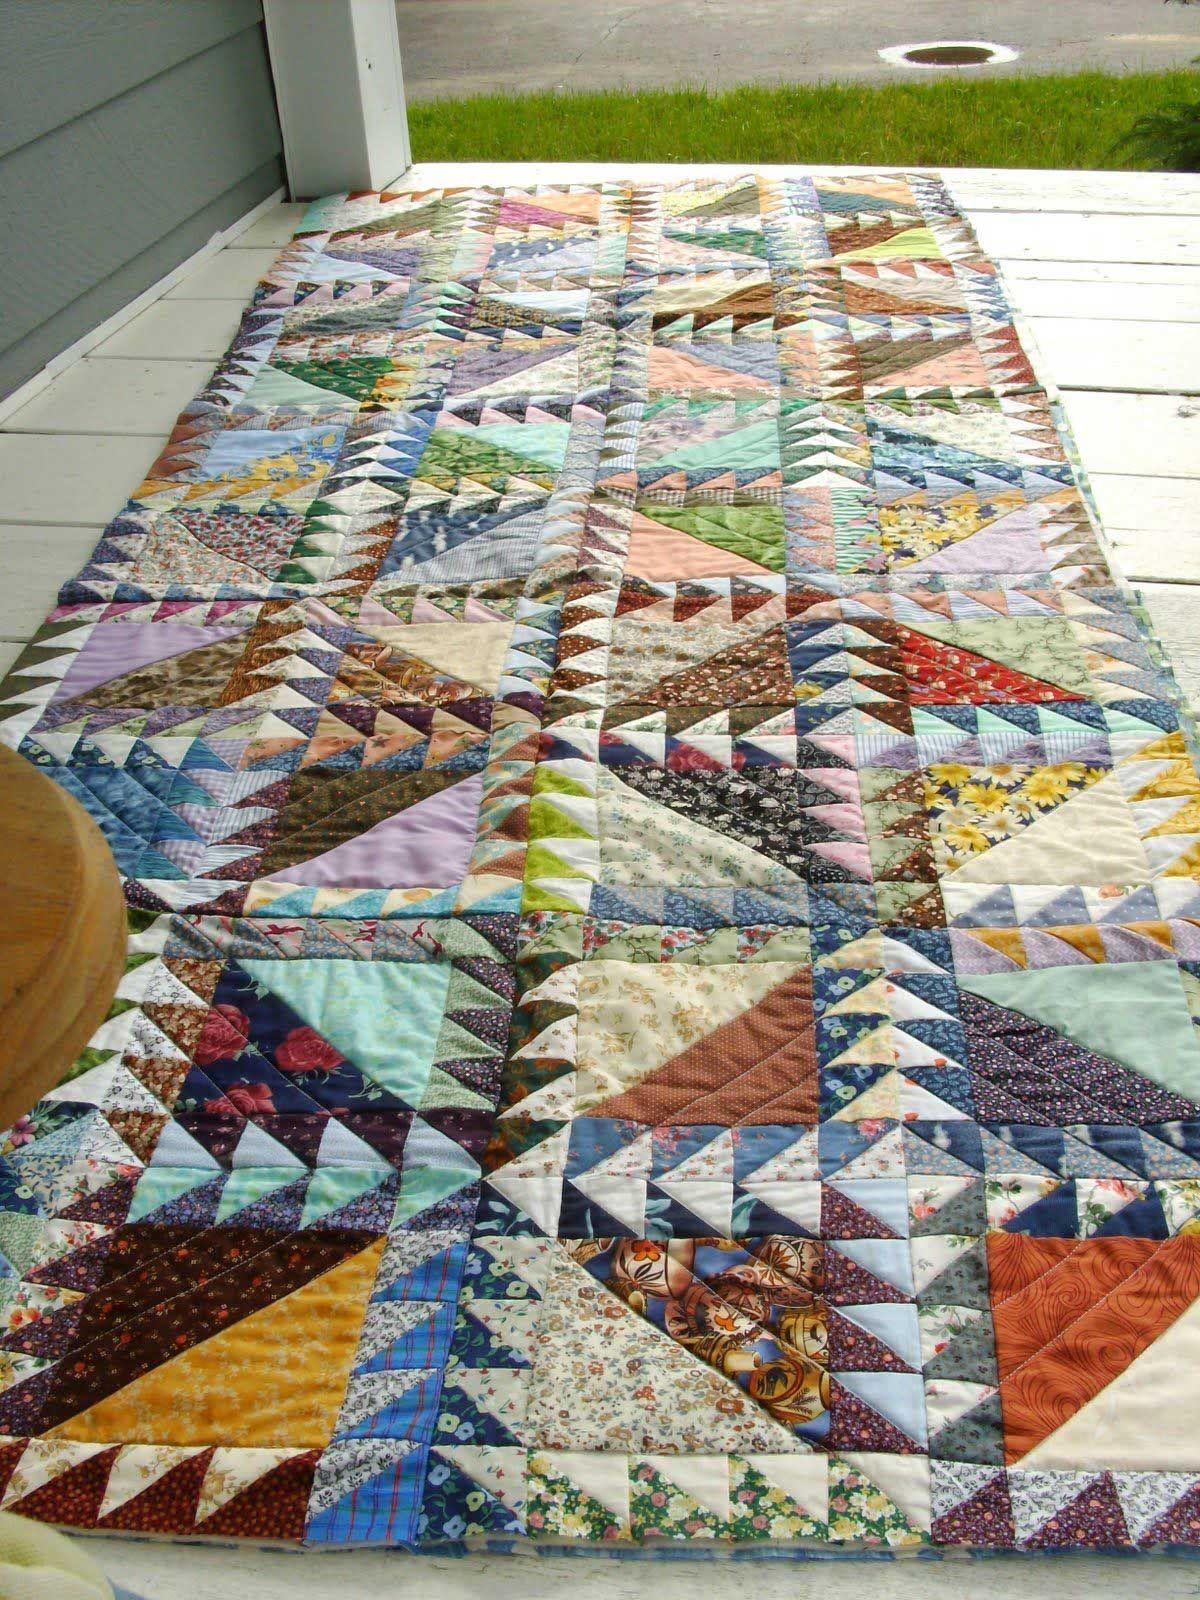 24 Fresh Bali Batik Quilts Patterns Free Quilts Batik Quilts Quilt Patterns Free